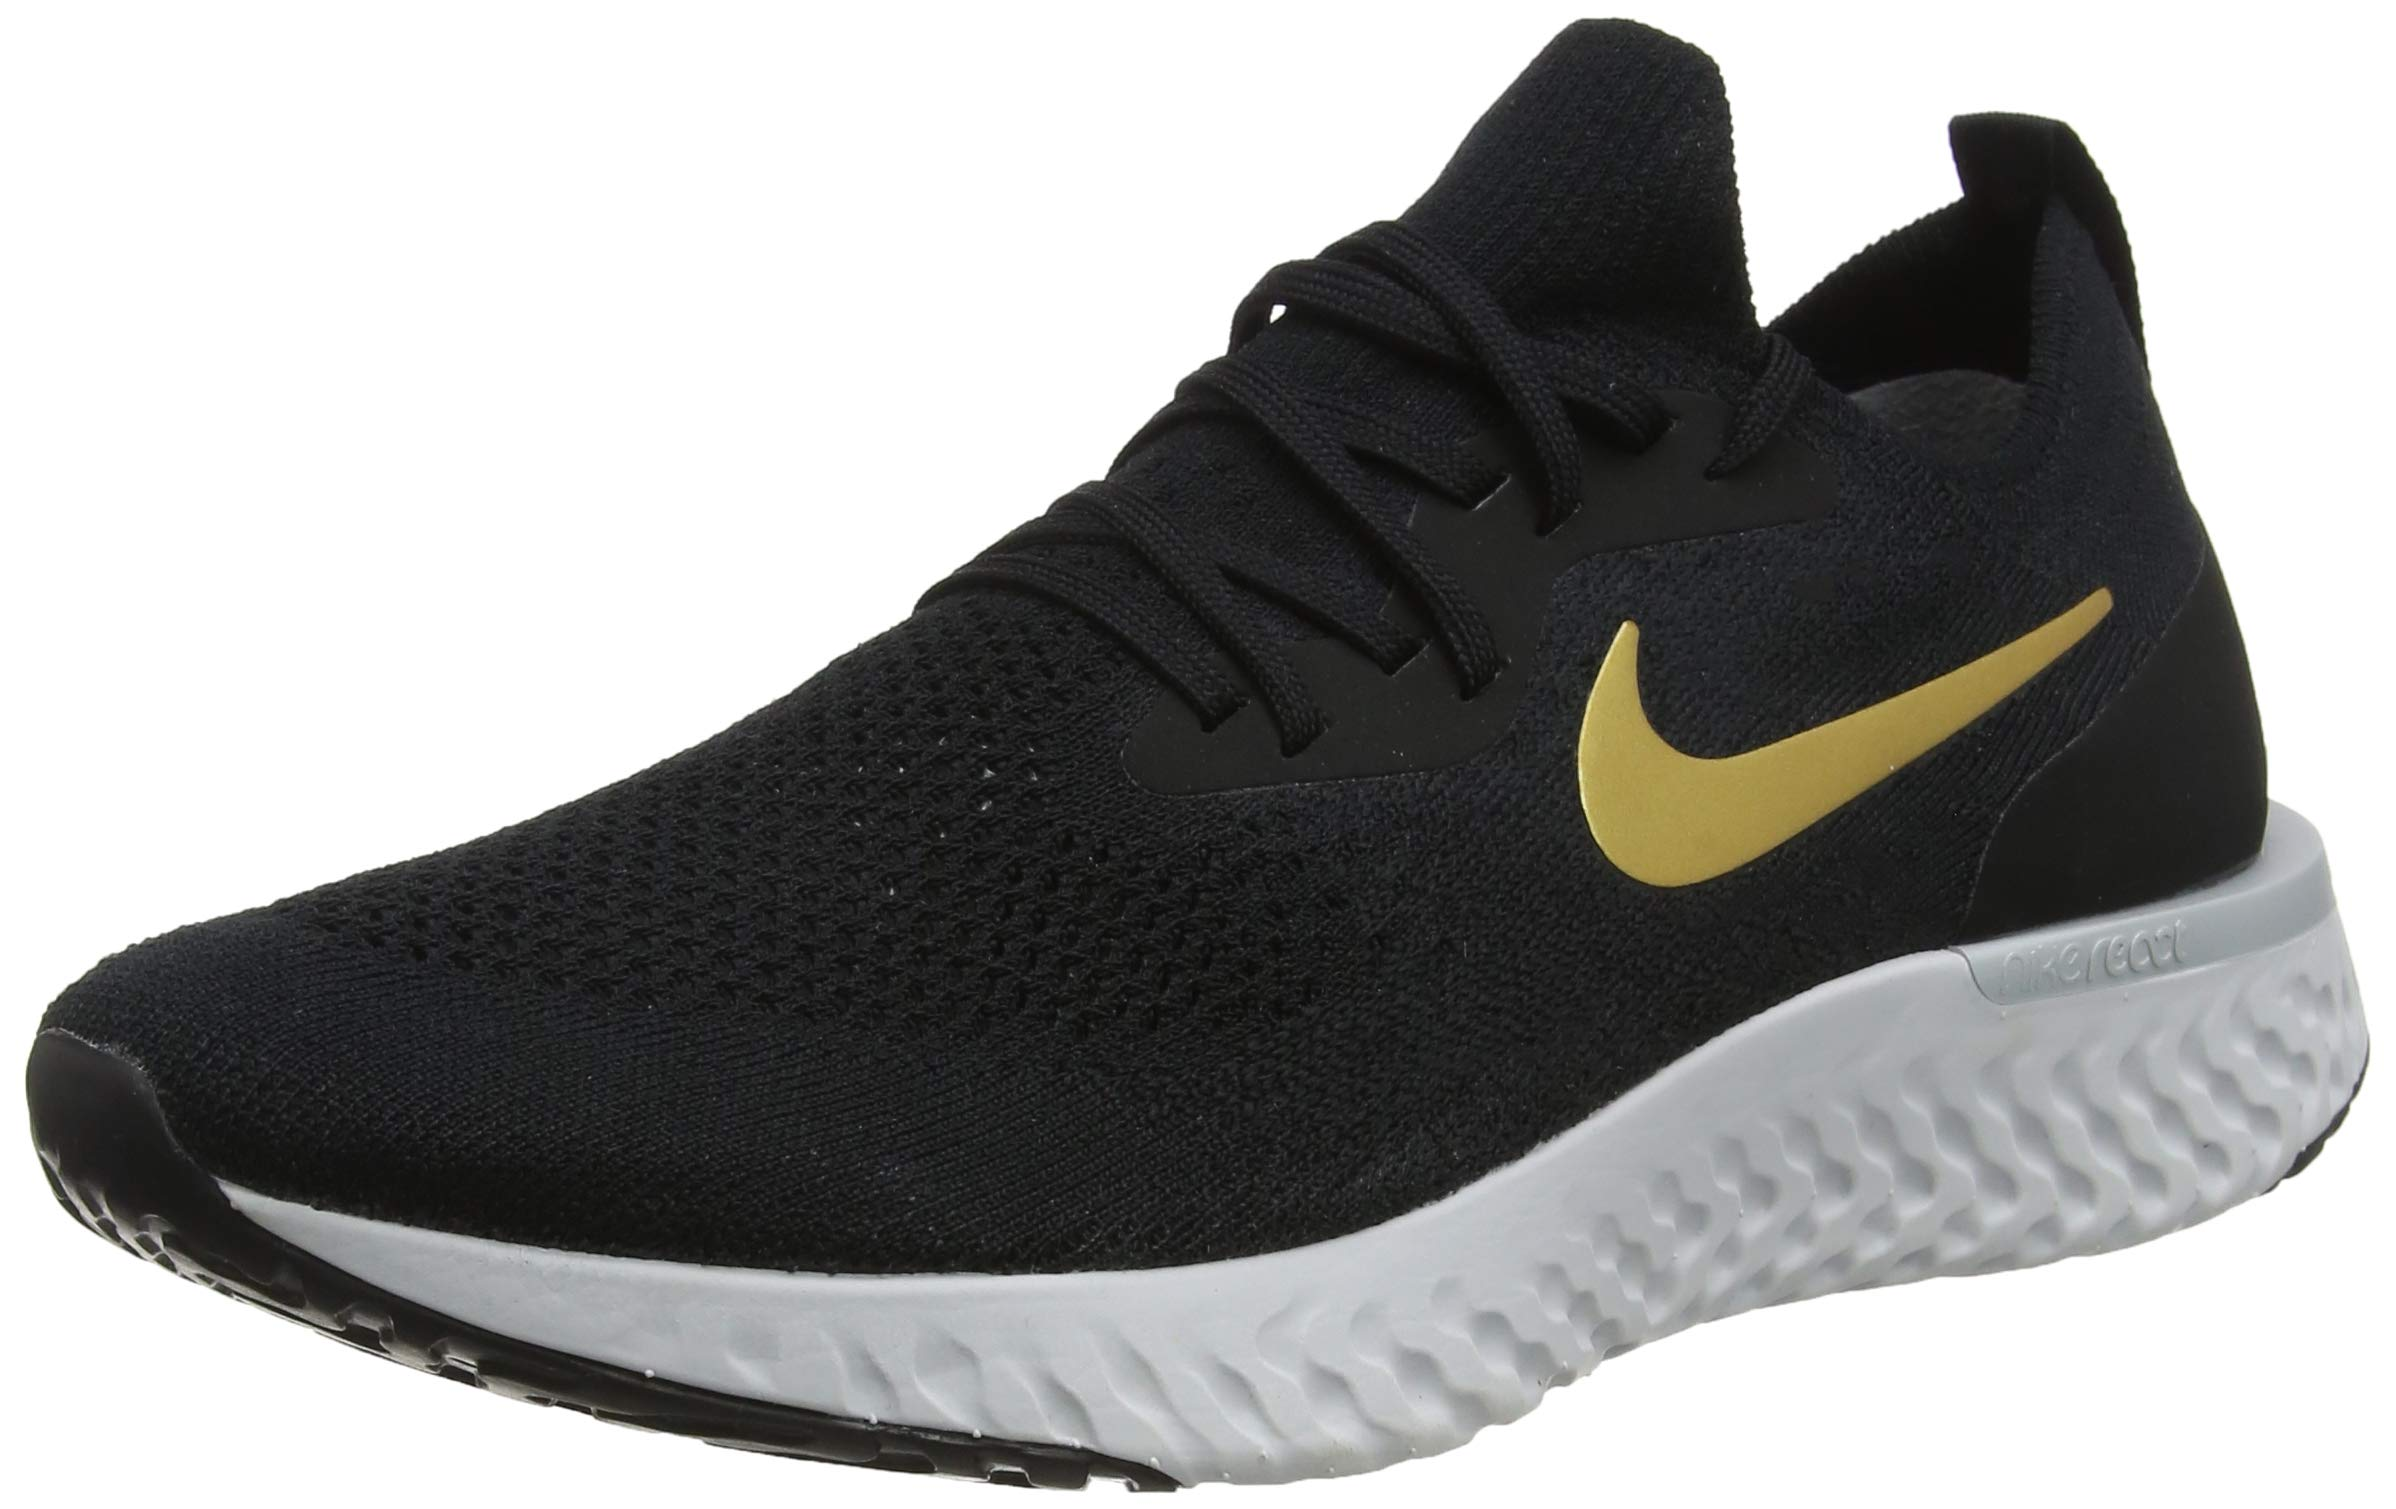 Nike Womens Epic React Flyknit Running Shoes (10) BlackMetallic Gold